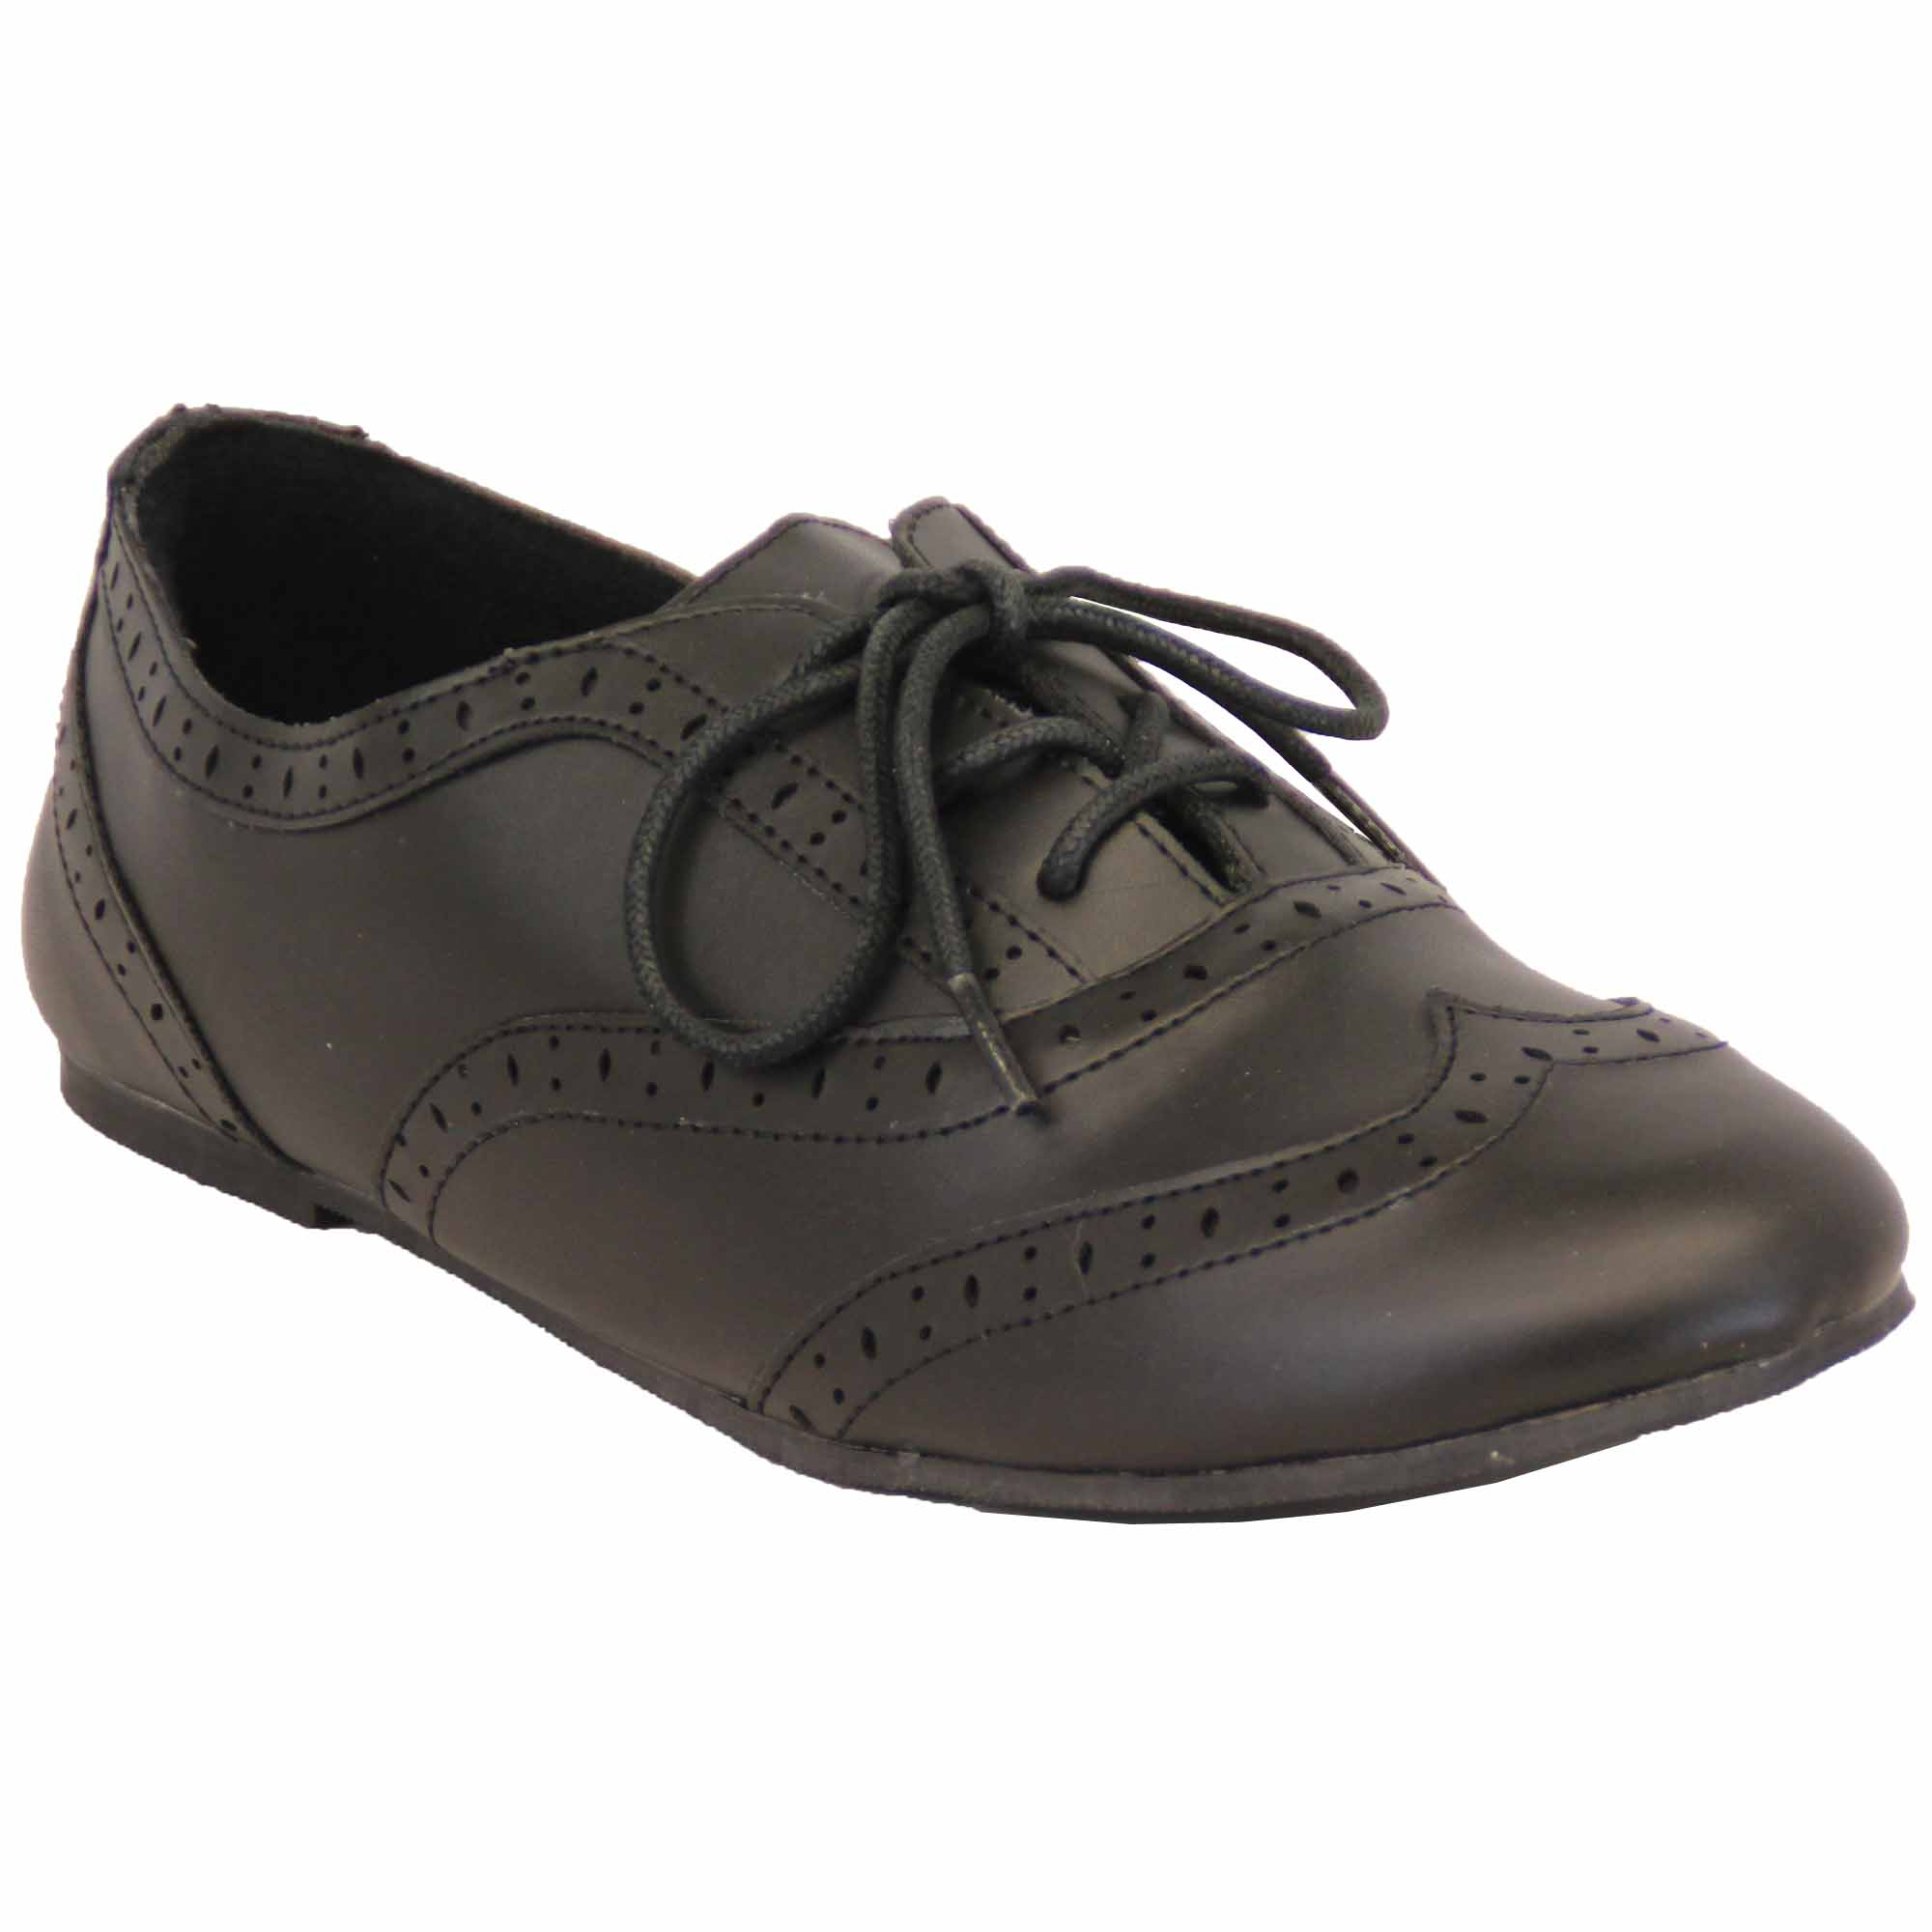 Girls School Shoes Matt Brogue Wedding Kids Leather Look ...